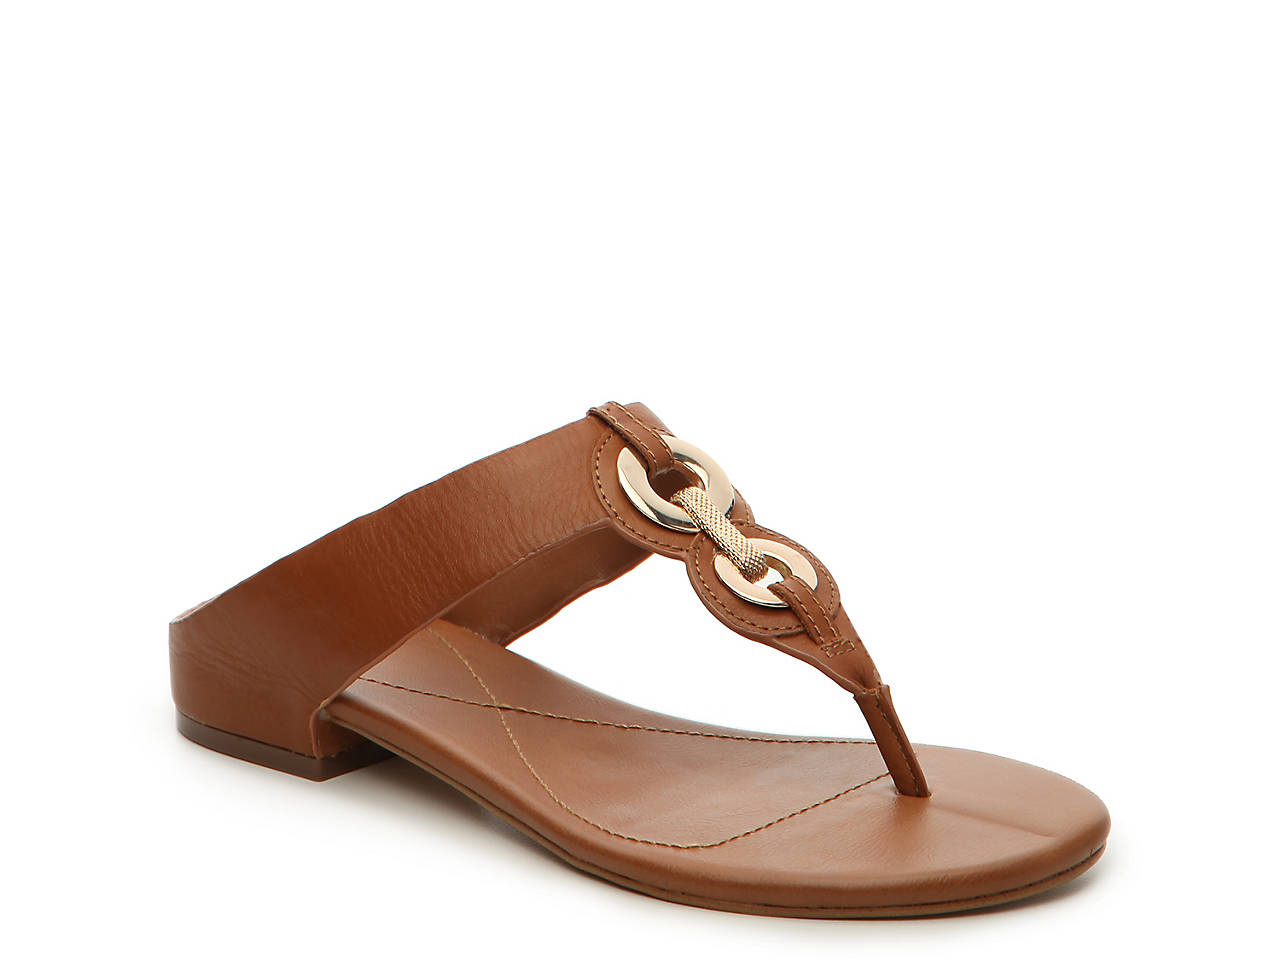 f643ee4648d9 Isola Sabrina Flat Sandal Women s Shoes